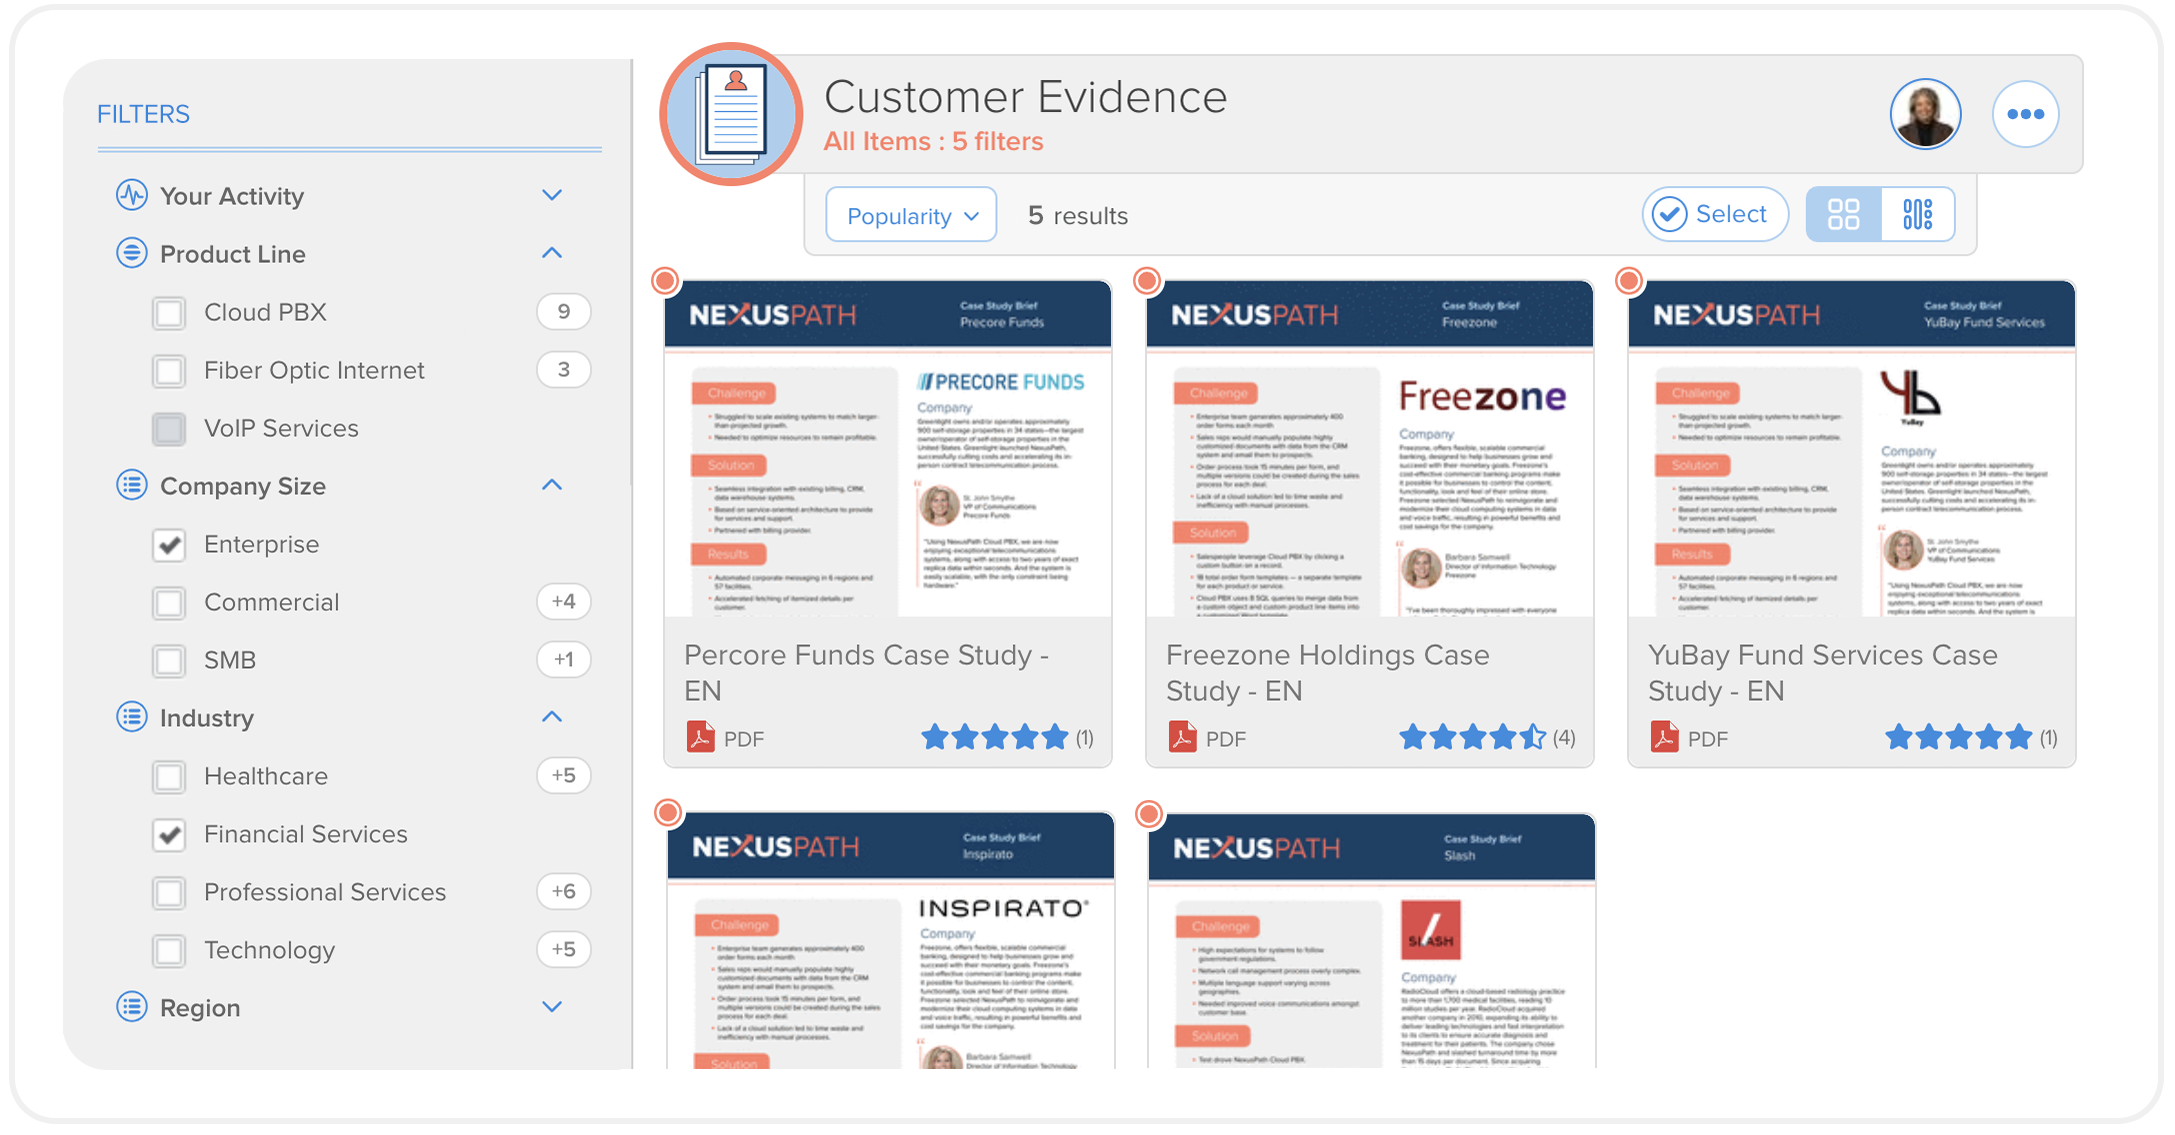 Customer evidence